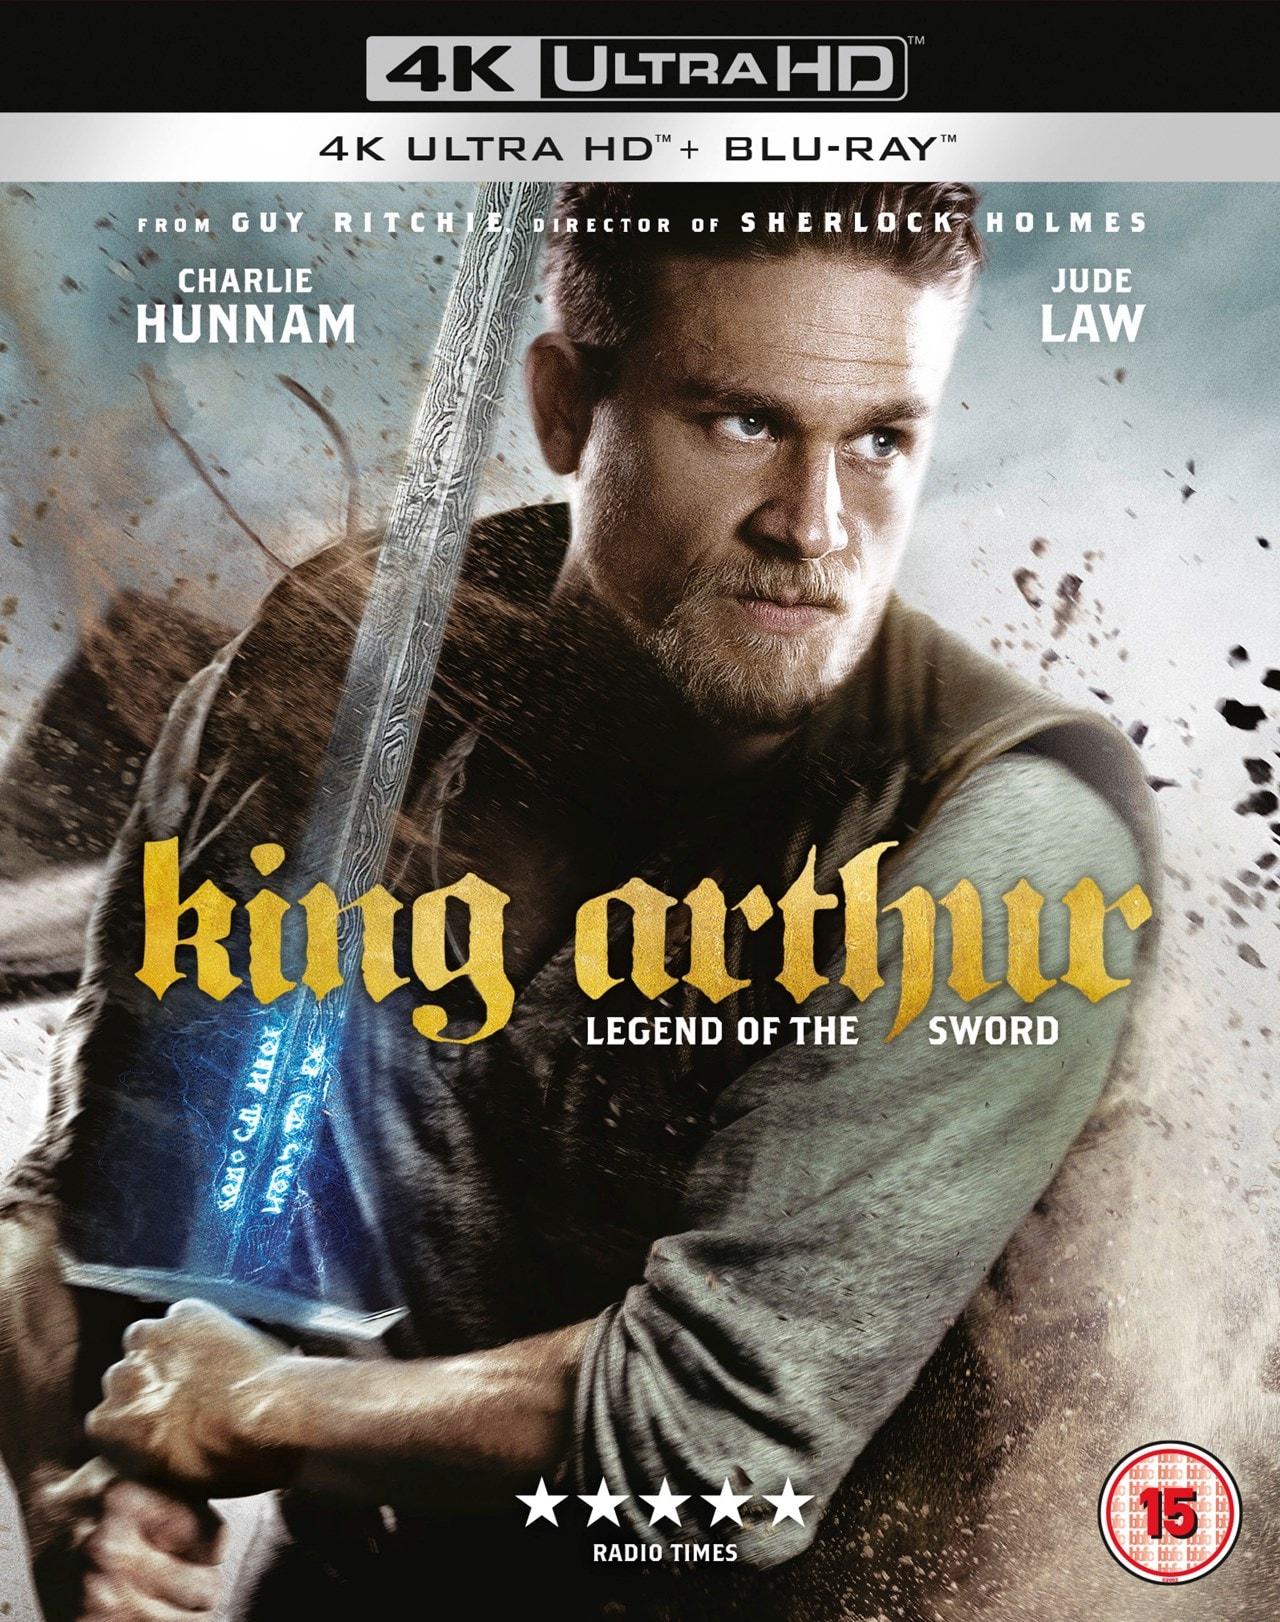 King Arthur - Legend of the Sword - 1